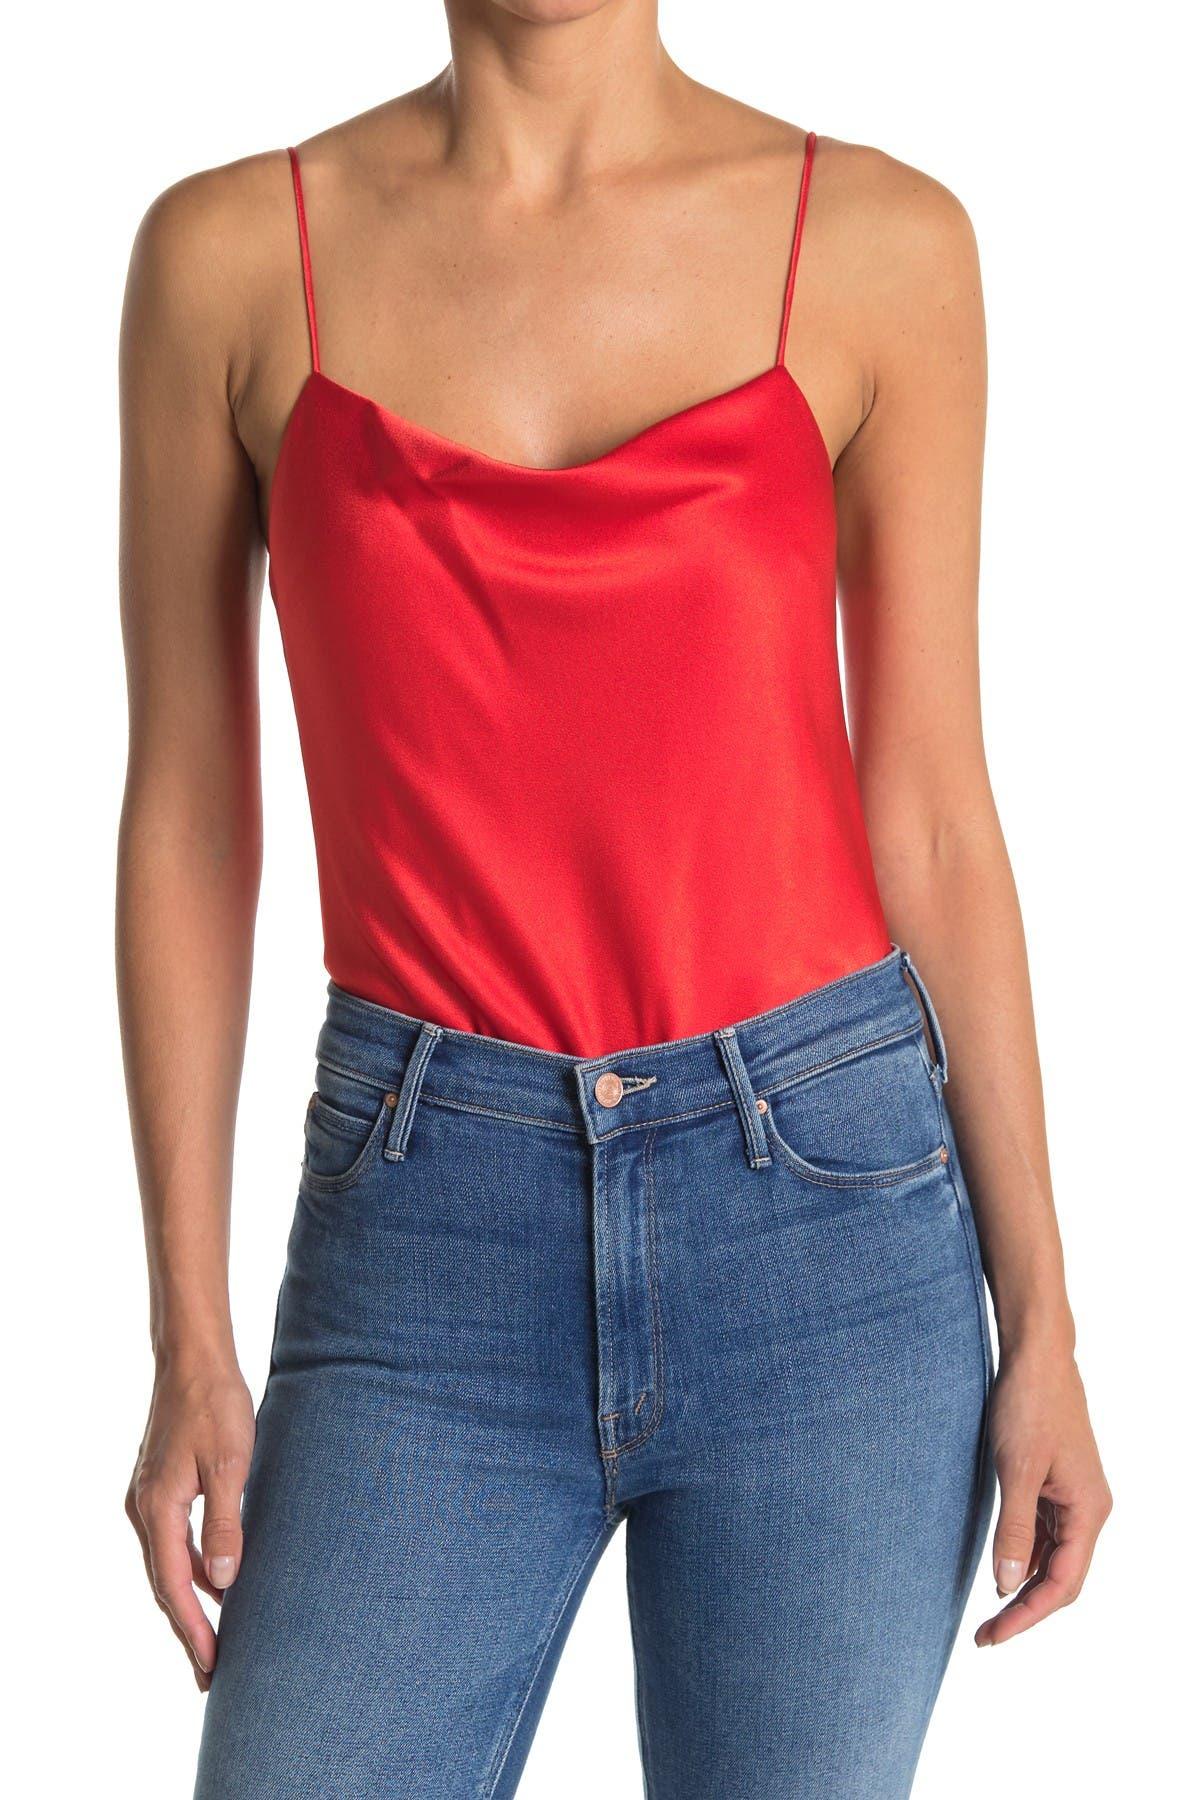 Image of alice + olivia Harmon Satin Bodysuit